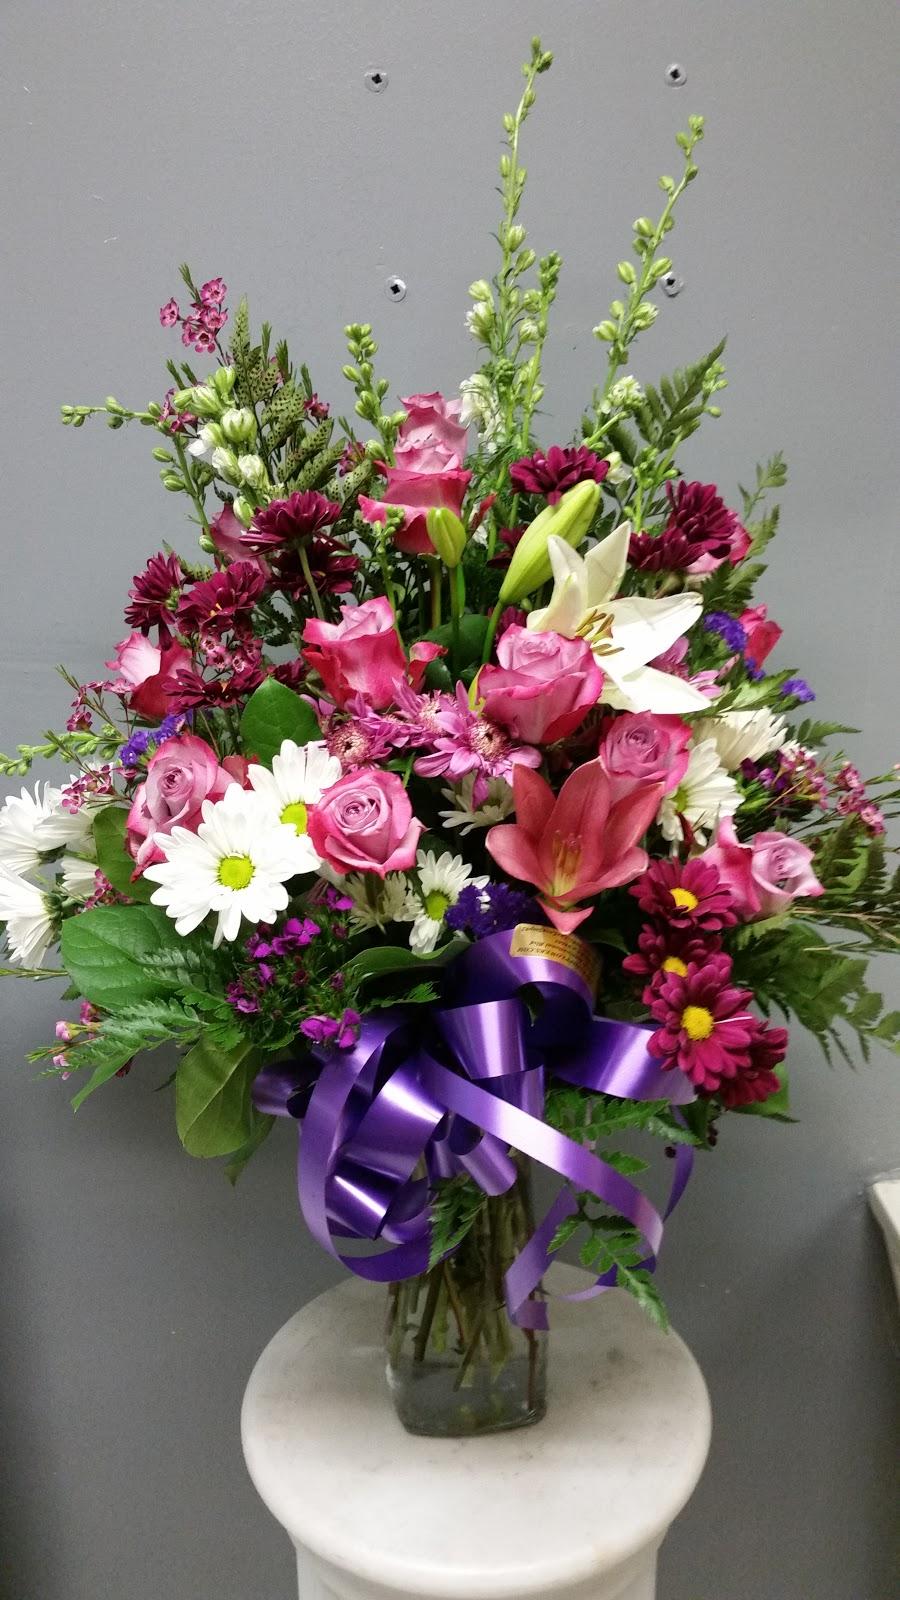 The Love Stop Florist - florist    Photo 7 of 10   Address: 1018 McHenry Ave, Modesto, CA 95350, USA   Phone: (510) 919-5148